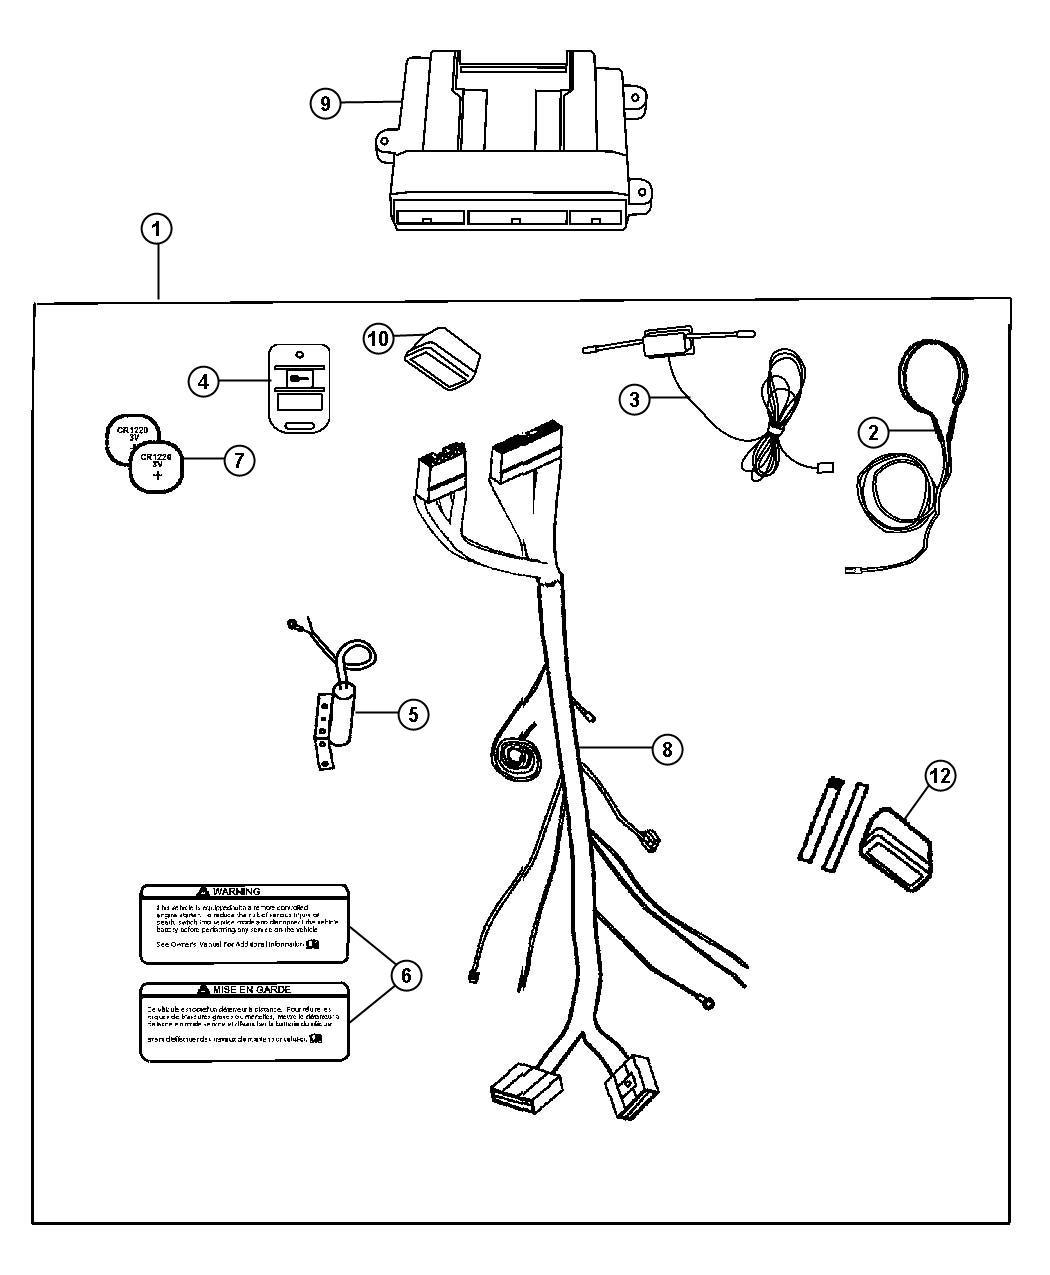 remote start system long range plugnplay